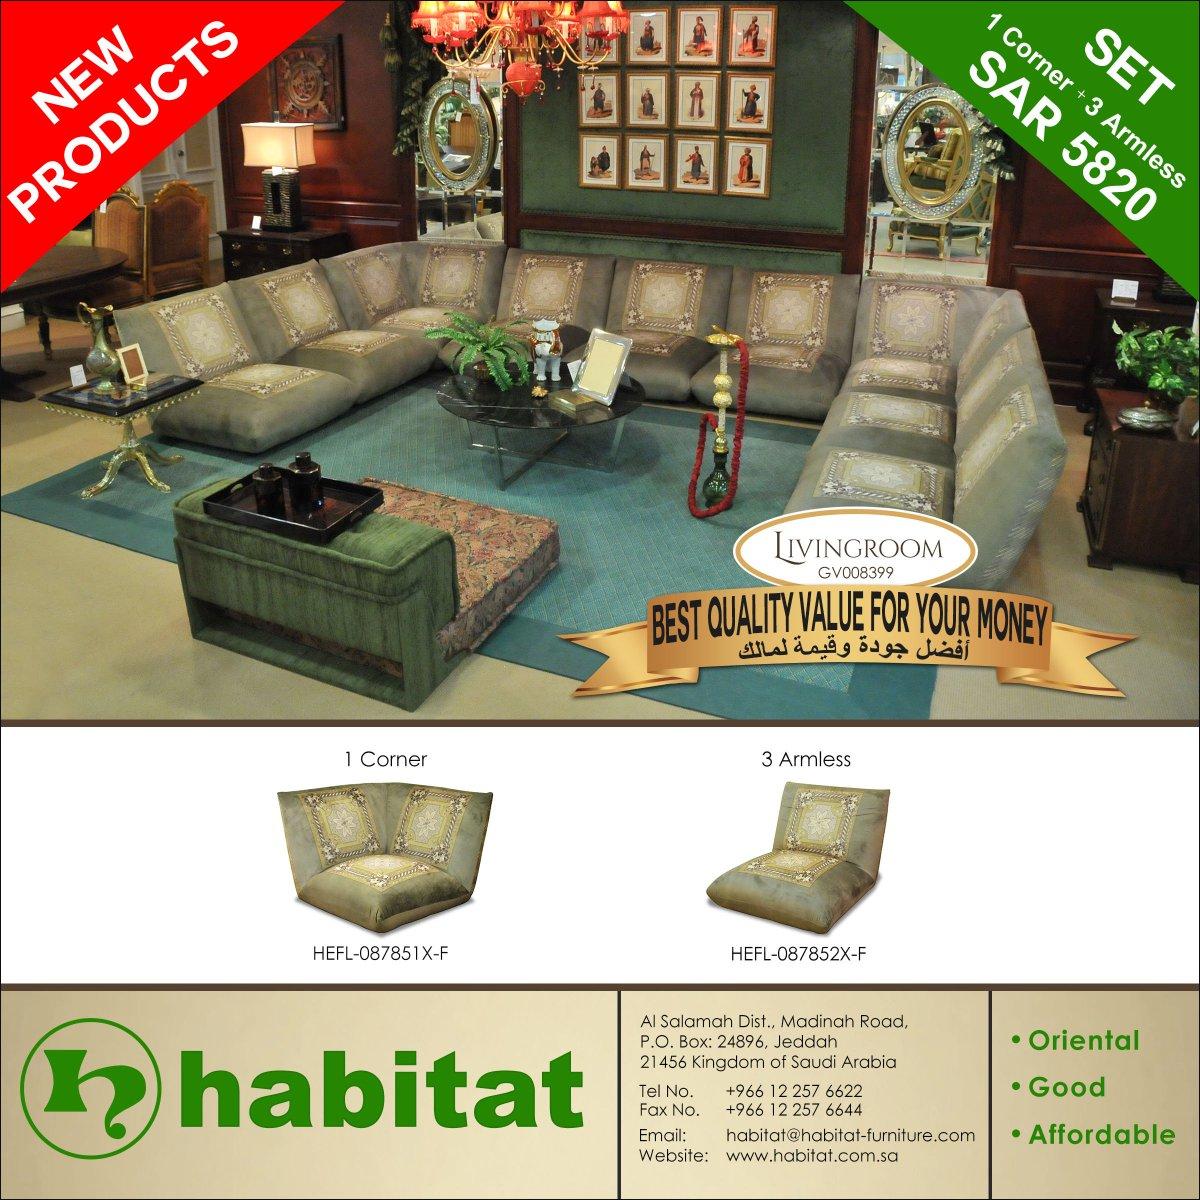 Habitat Furniture On Twitter LIVINGROOM Habitathabitat Tco YDoLznyiJQ Note Price May Change Without Prior Notice